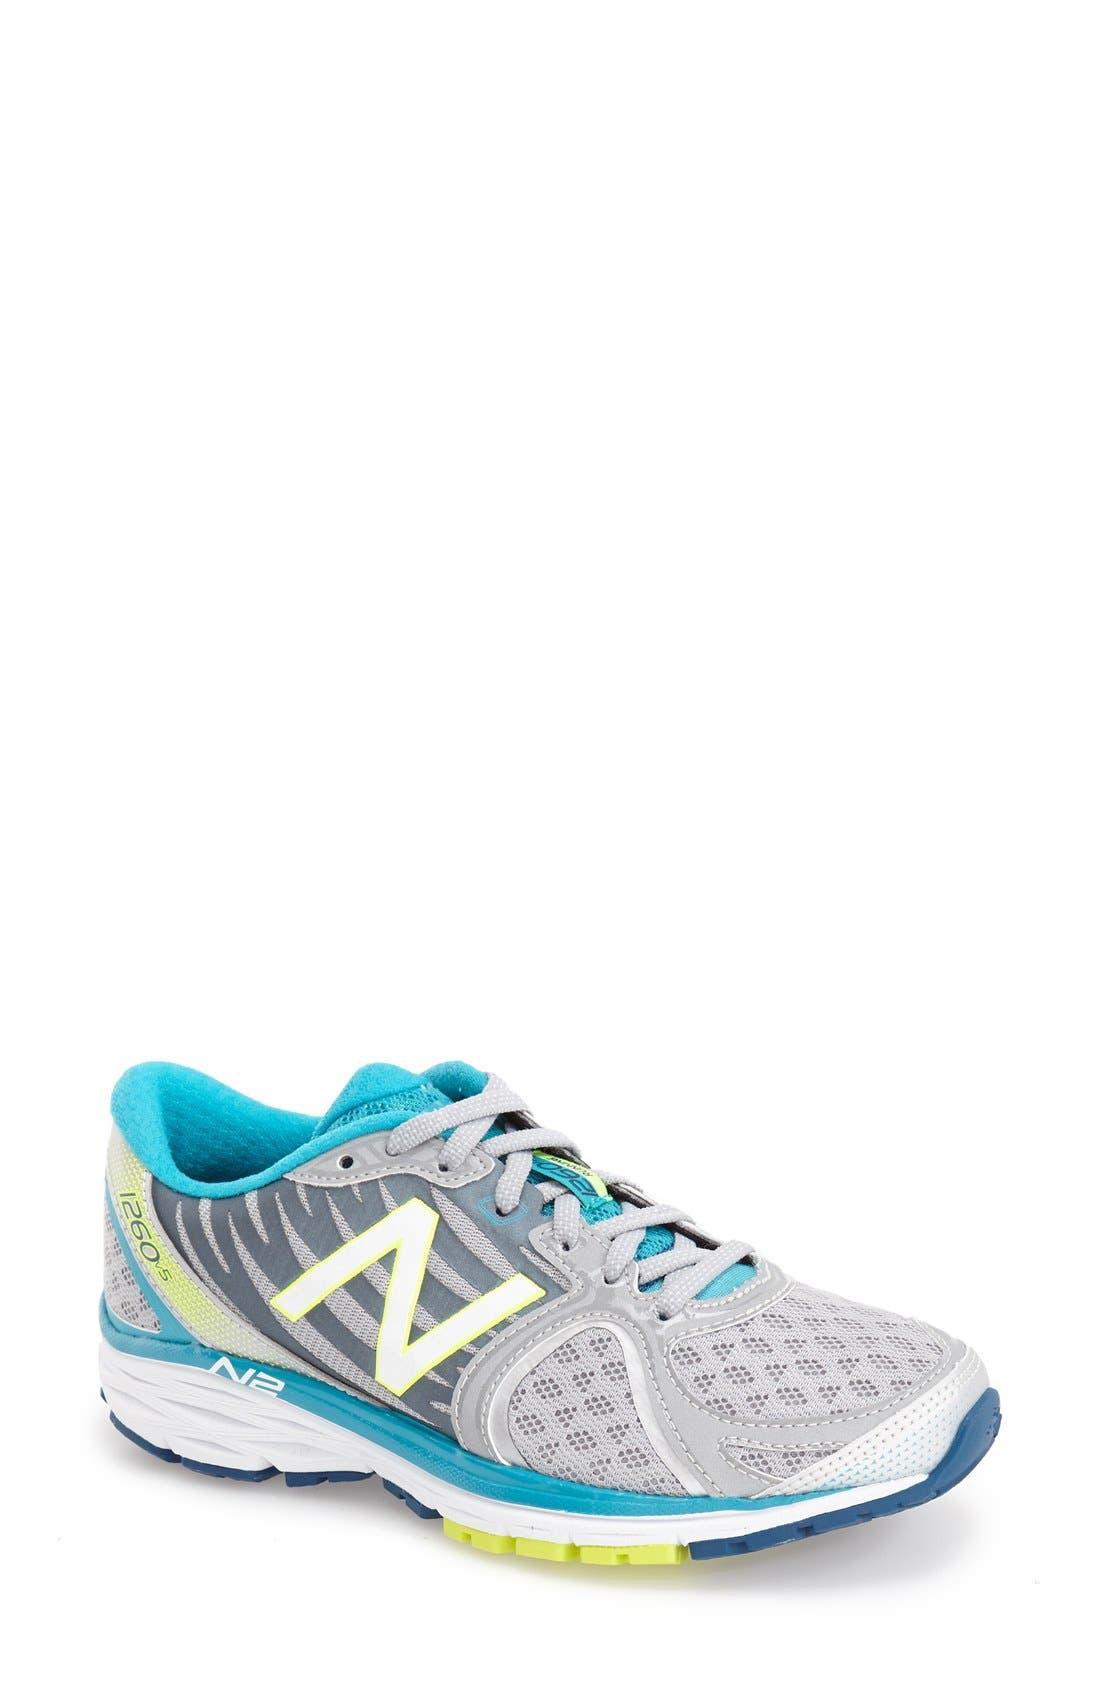 1260 v5' Running Shoe,                             Main thumbnail 1, color,                             041